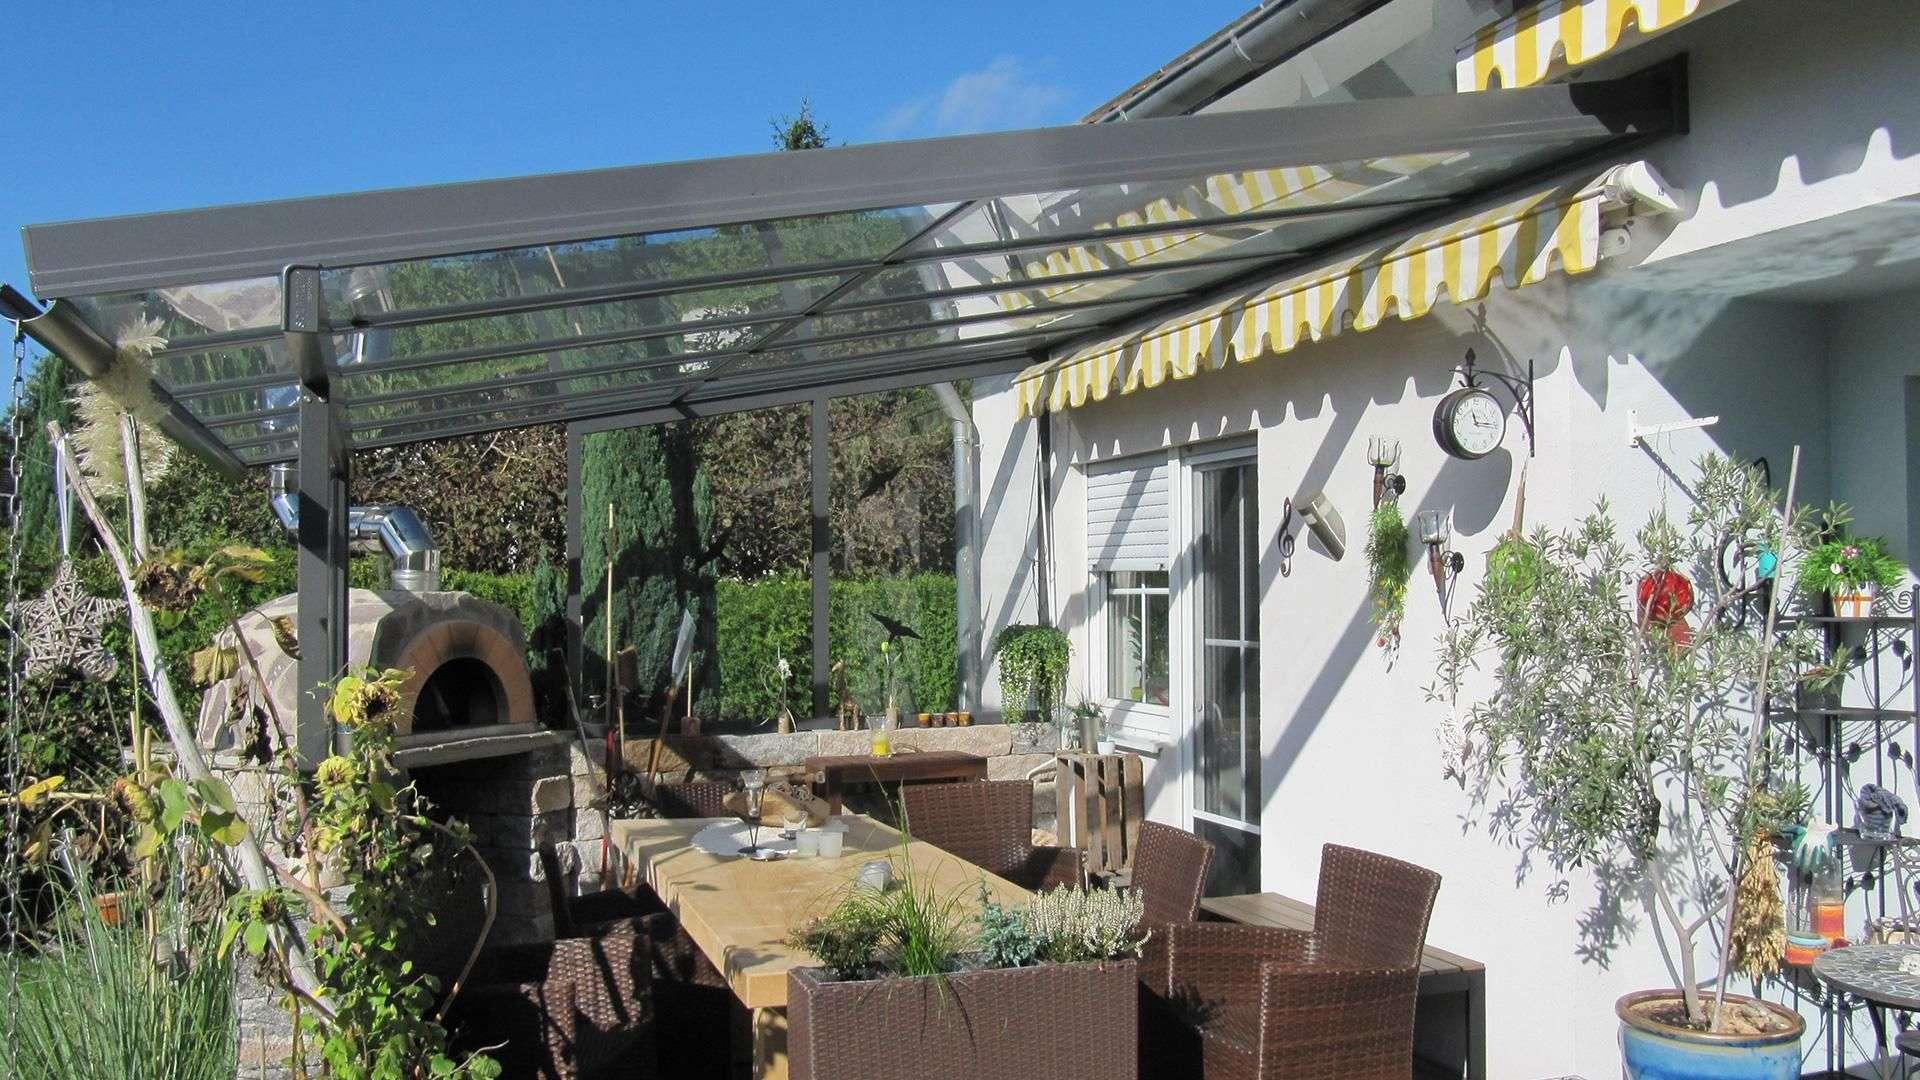 Singold Wintergarten24